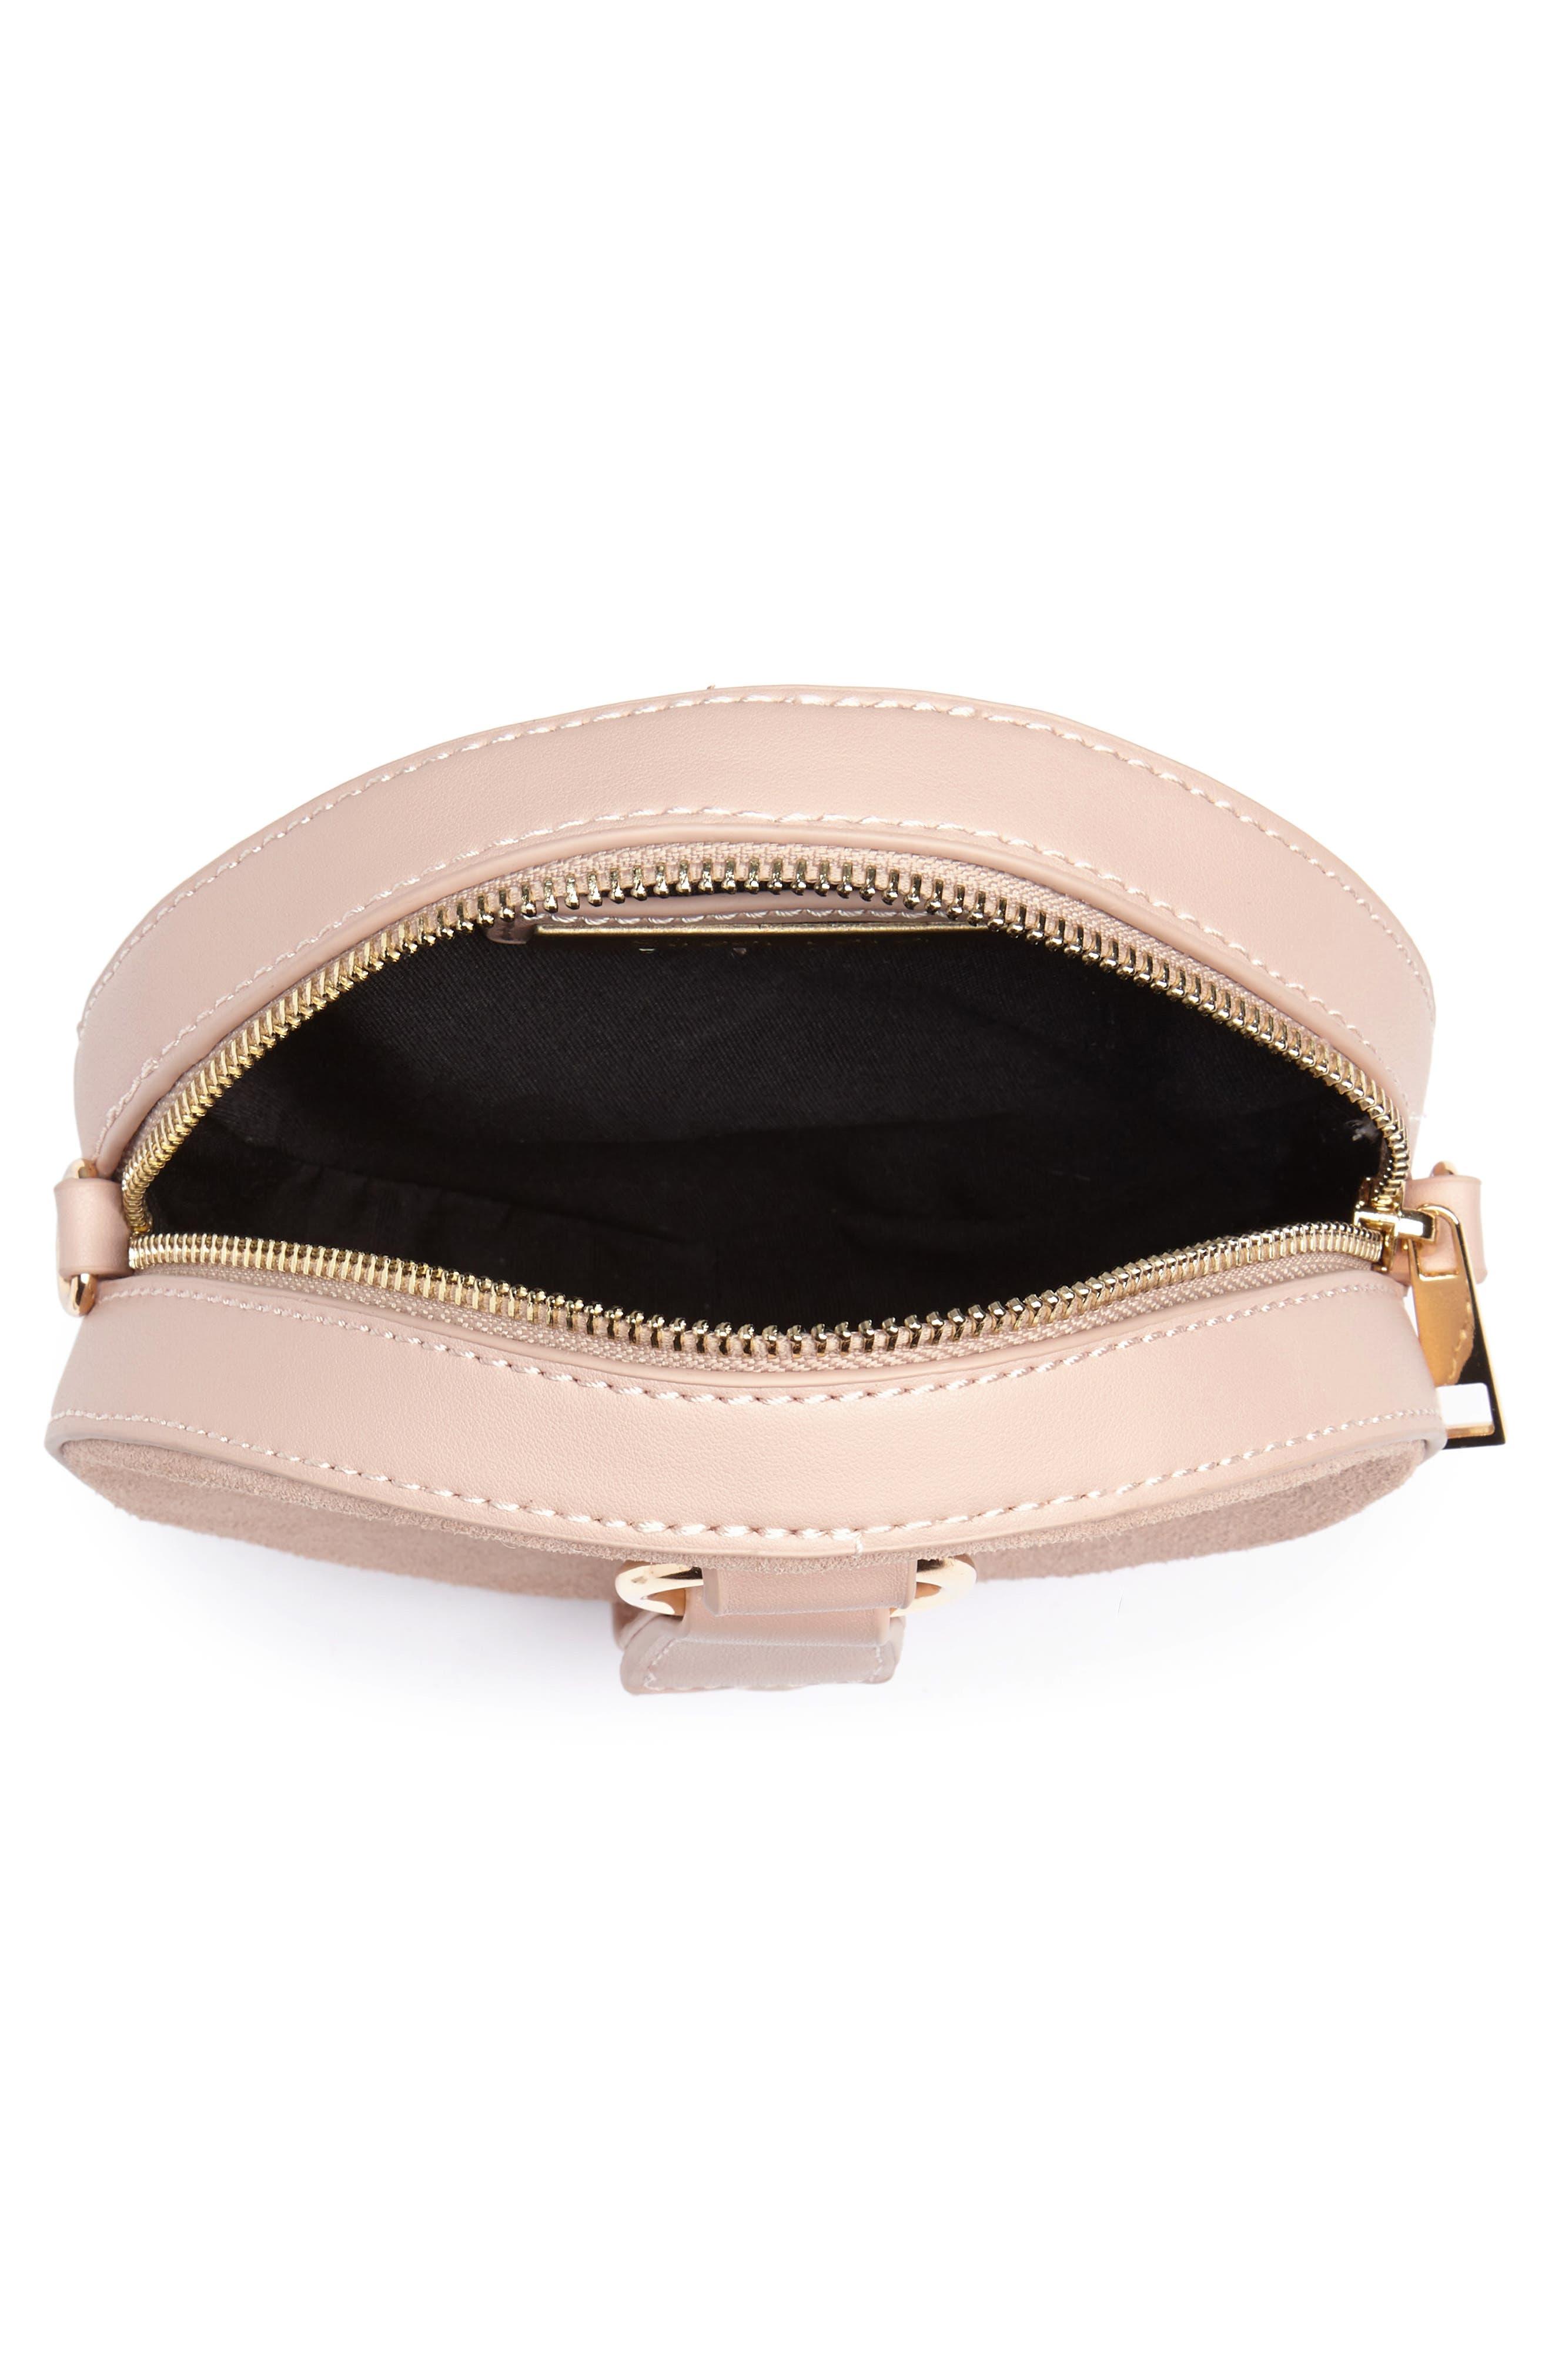 Circle Bag with Wristlet,                             Alternate thumbnail 4, color,                             Tan